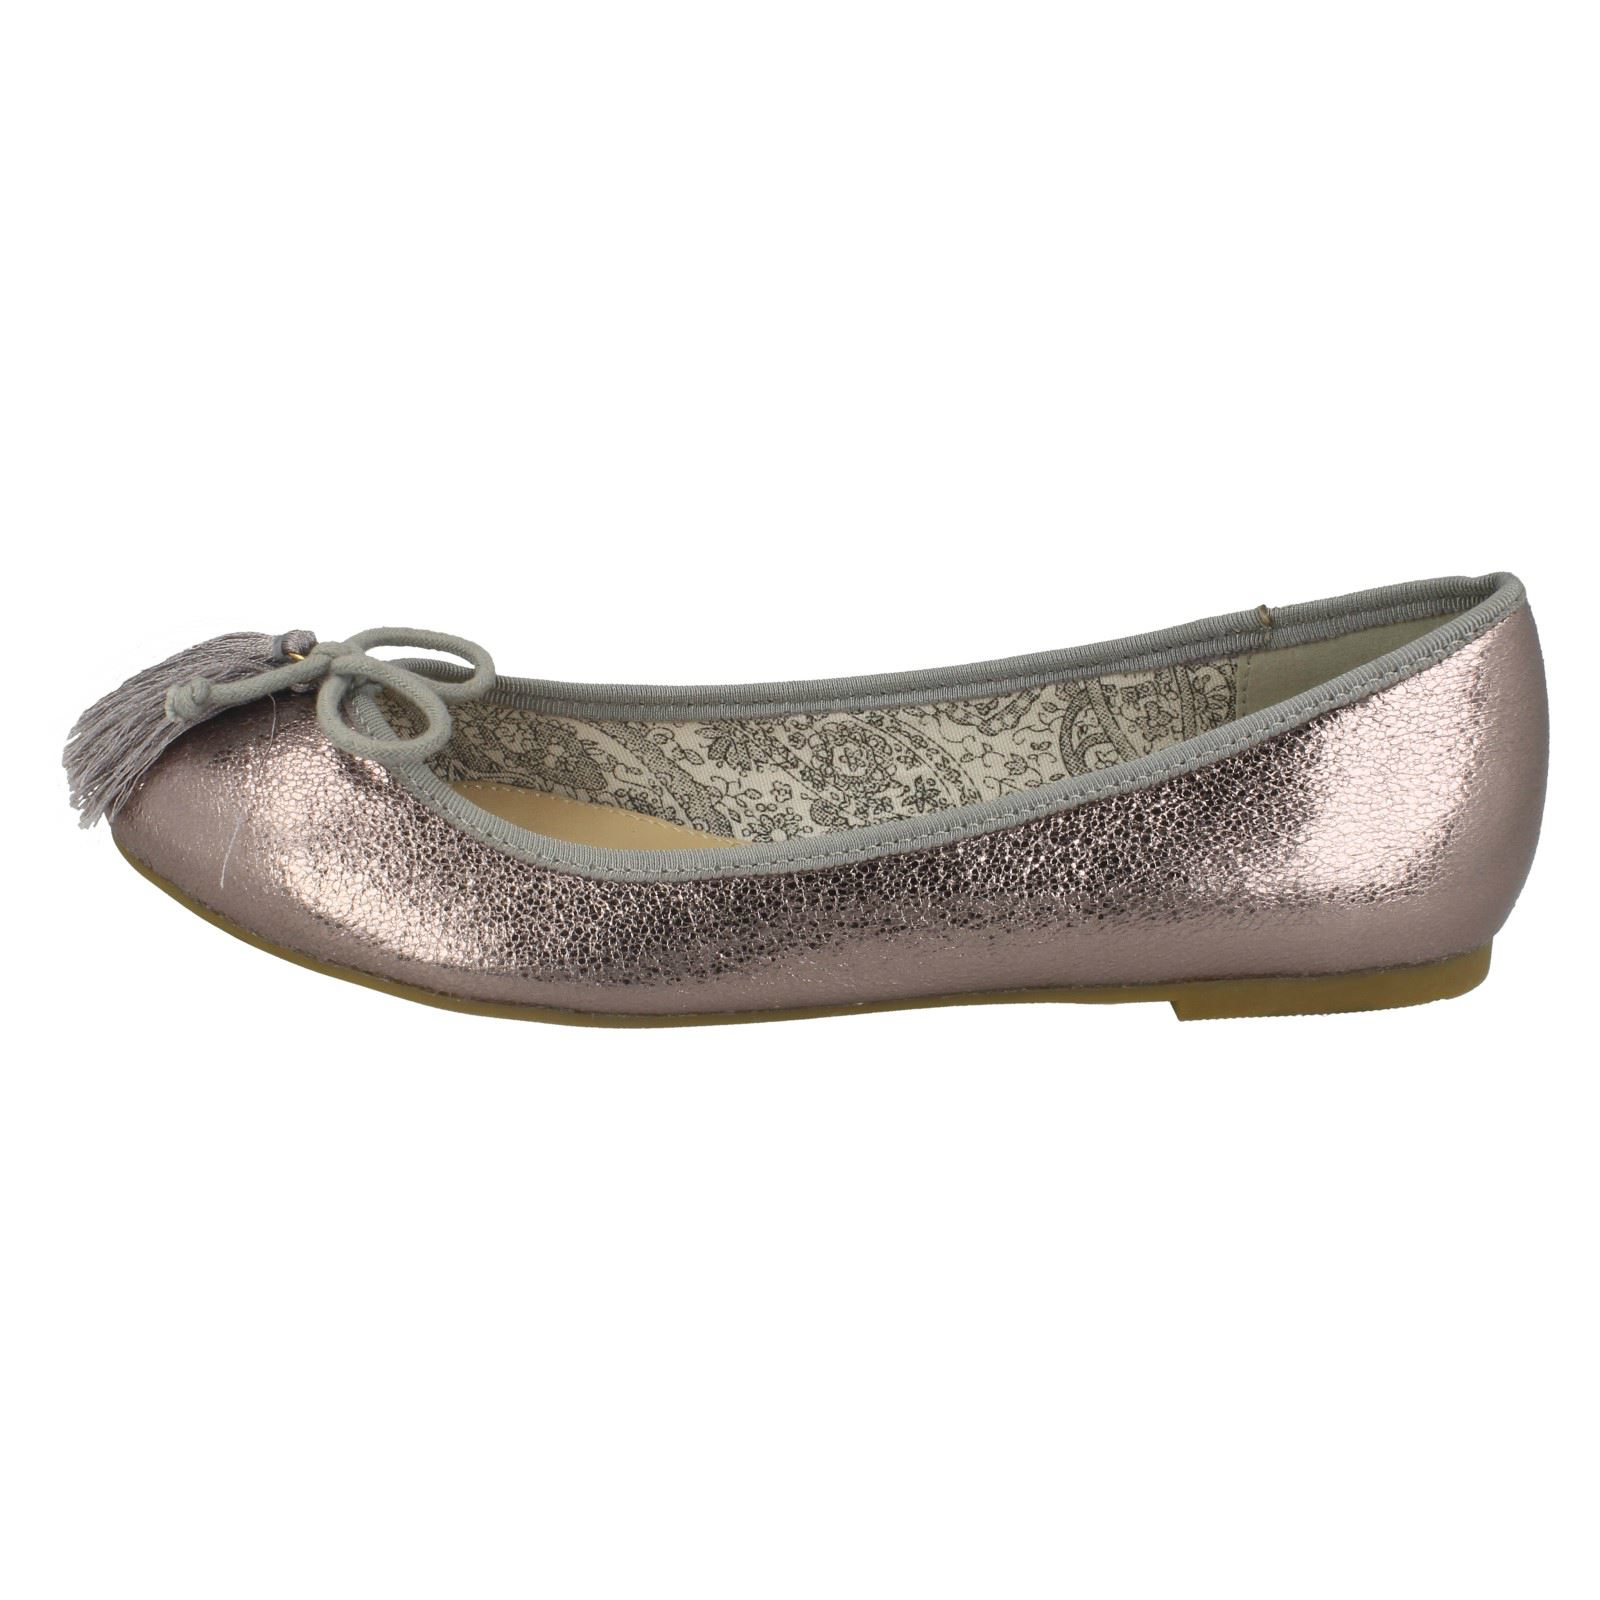 Ladies Spot On Flat Ballerinas With /'Tassel Bow Trim/'